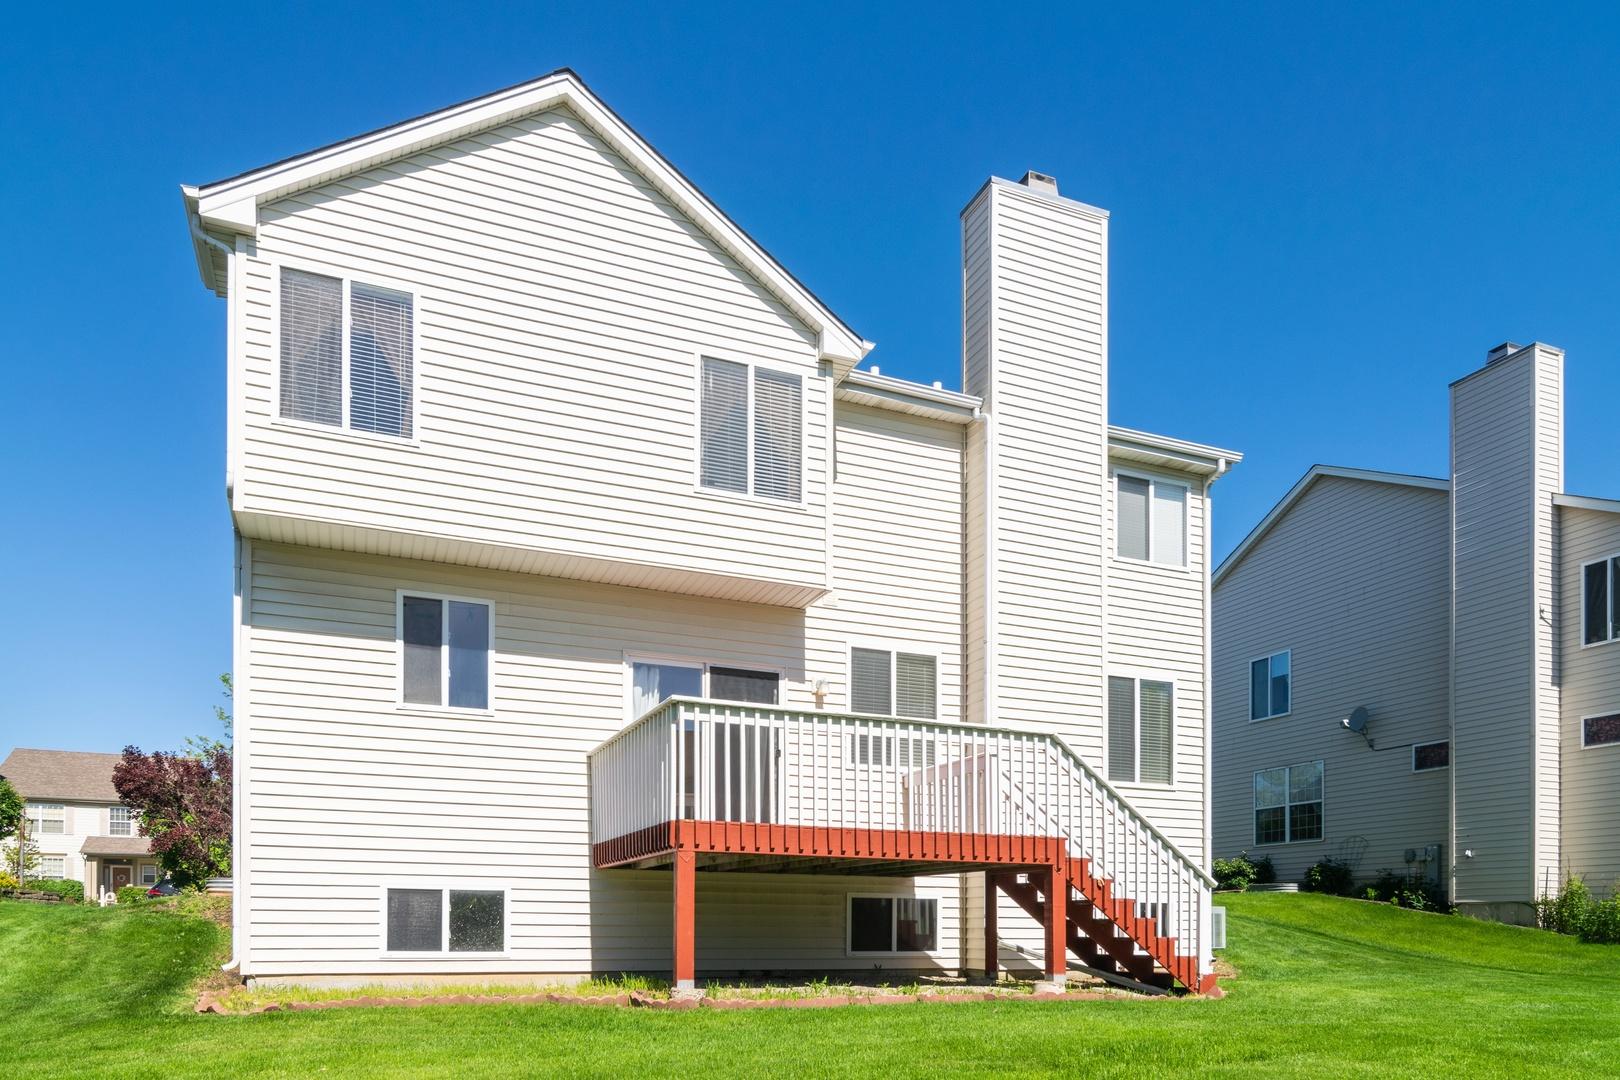 2085 Colchester, Hoffman Estates, Illinois, 60192